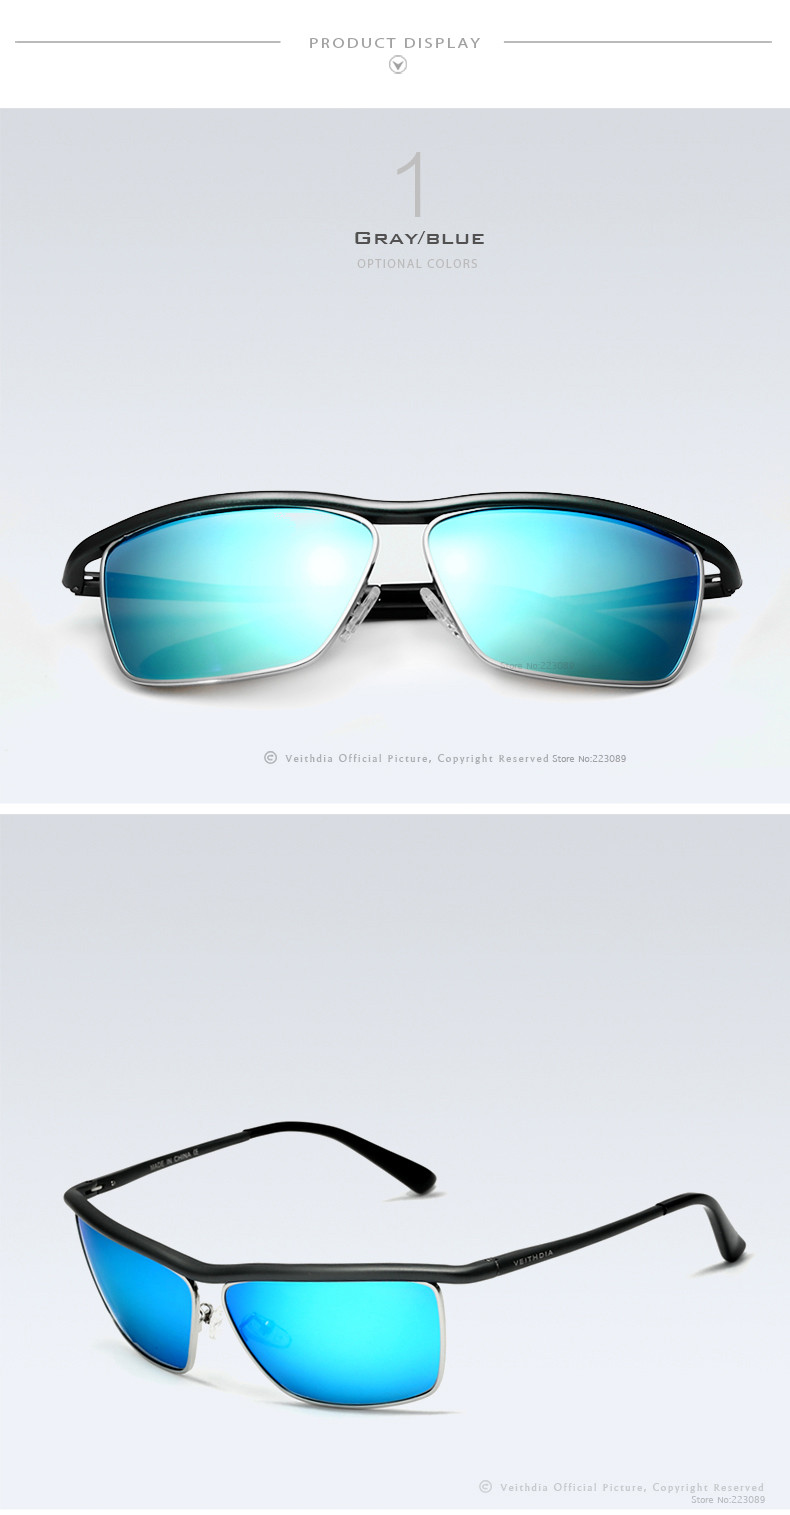 HTB1ugWzLpXXXXX0aXXXq6xXFXXXc - VEITHDIA Brand Aluminum Magnesium Men's Sun glasses Polarized Mirror Lens Eyewear Accessories Sunglasses For Men Oculos 6381